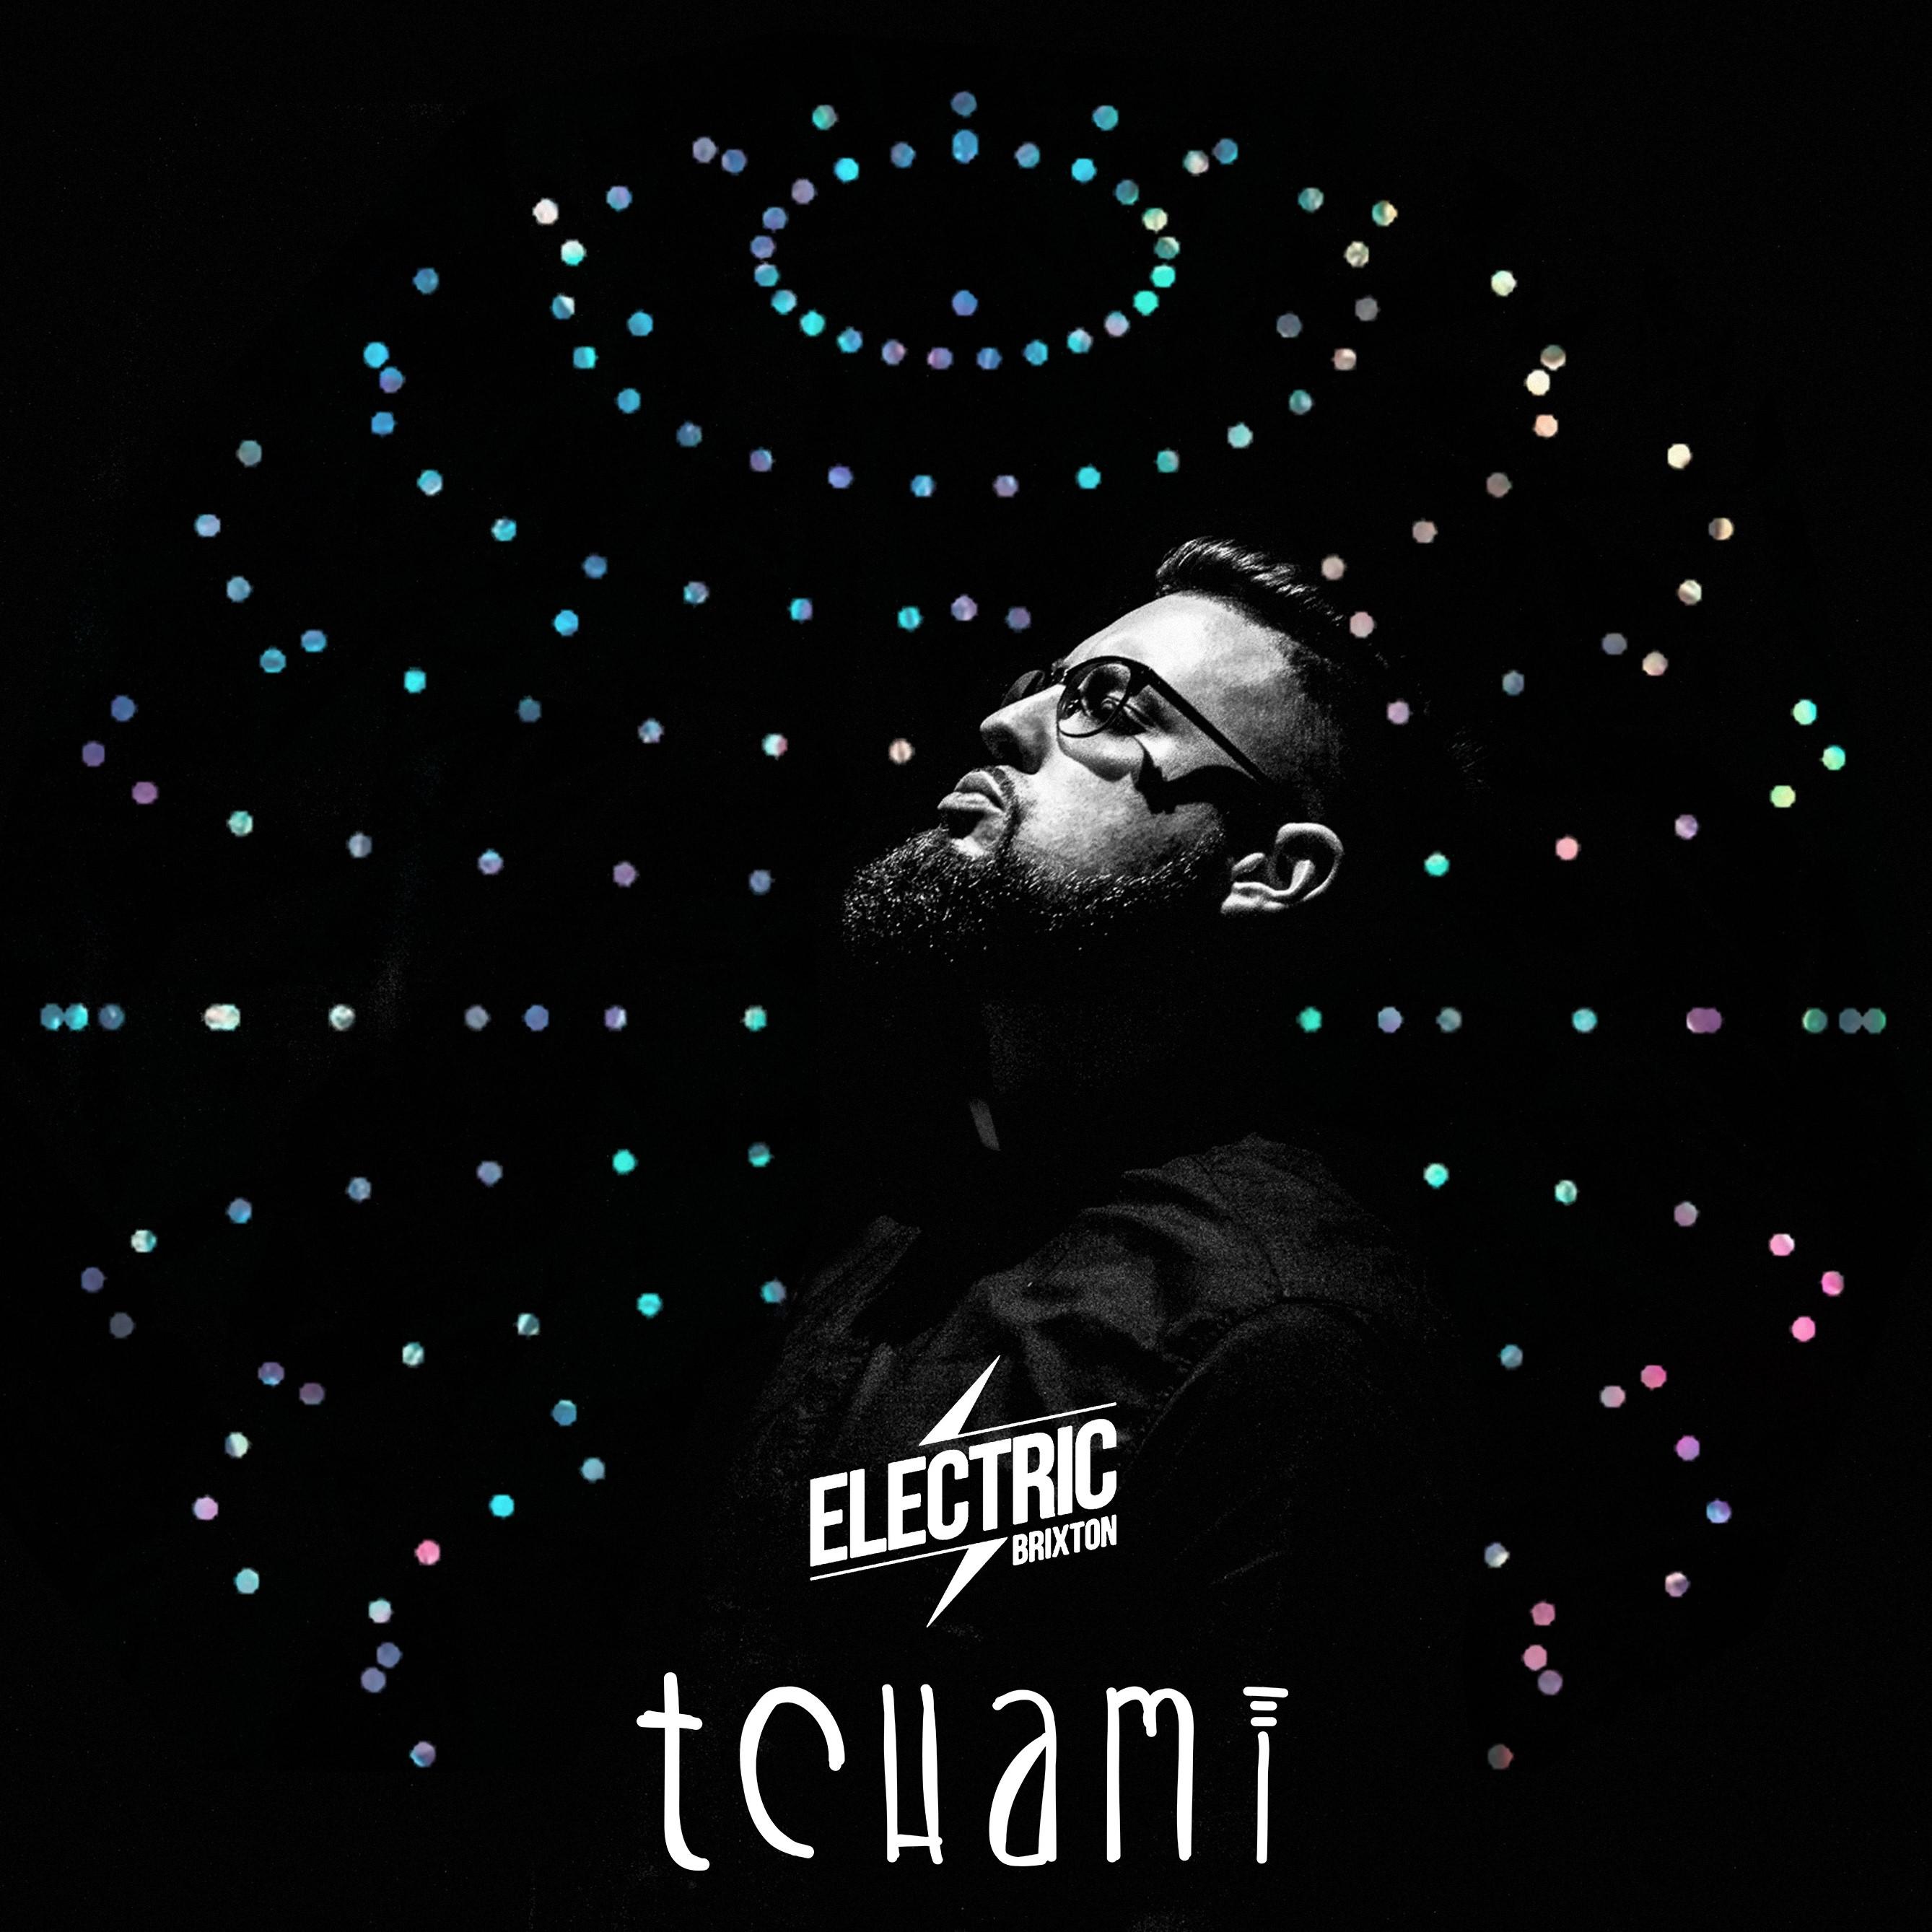 tchami_electric3.jpg